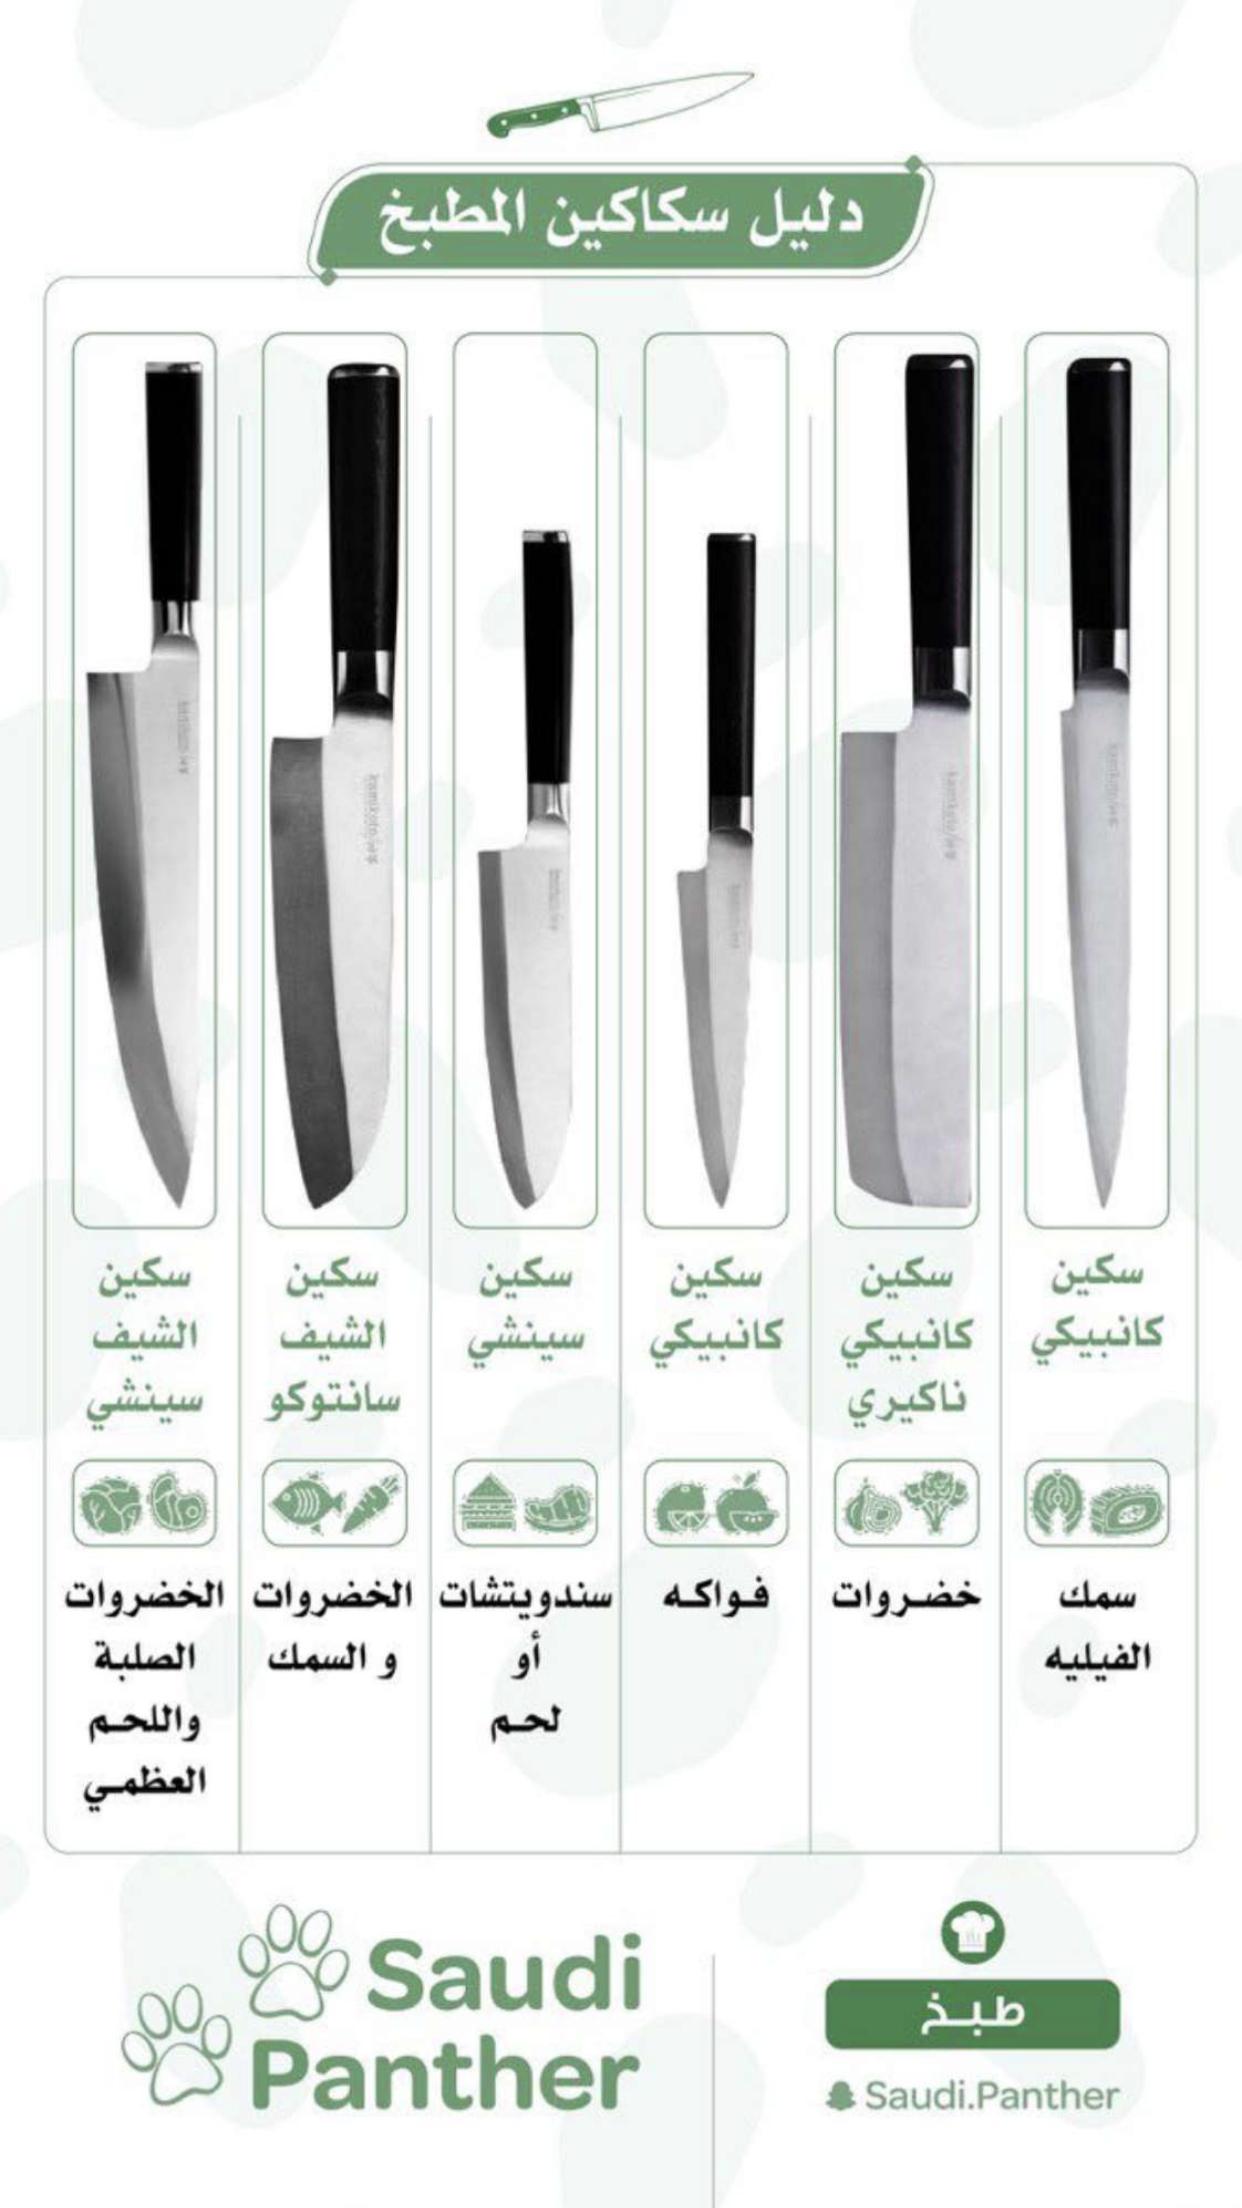 انواع سكاكين المطبخ واستخداماتها Cookout Food Cooking Seafood Food Garnishes